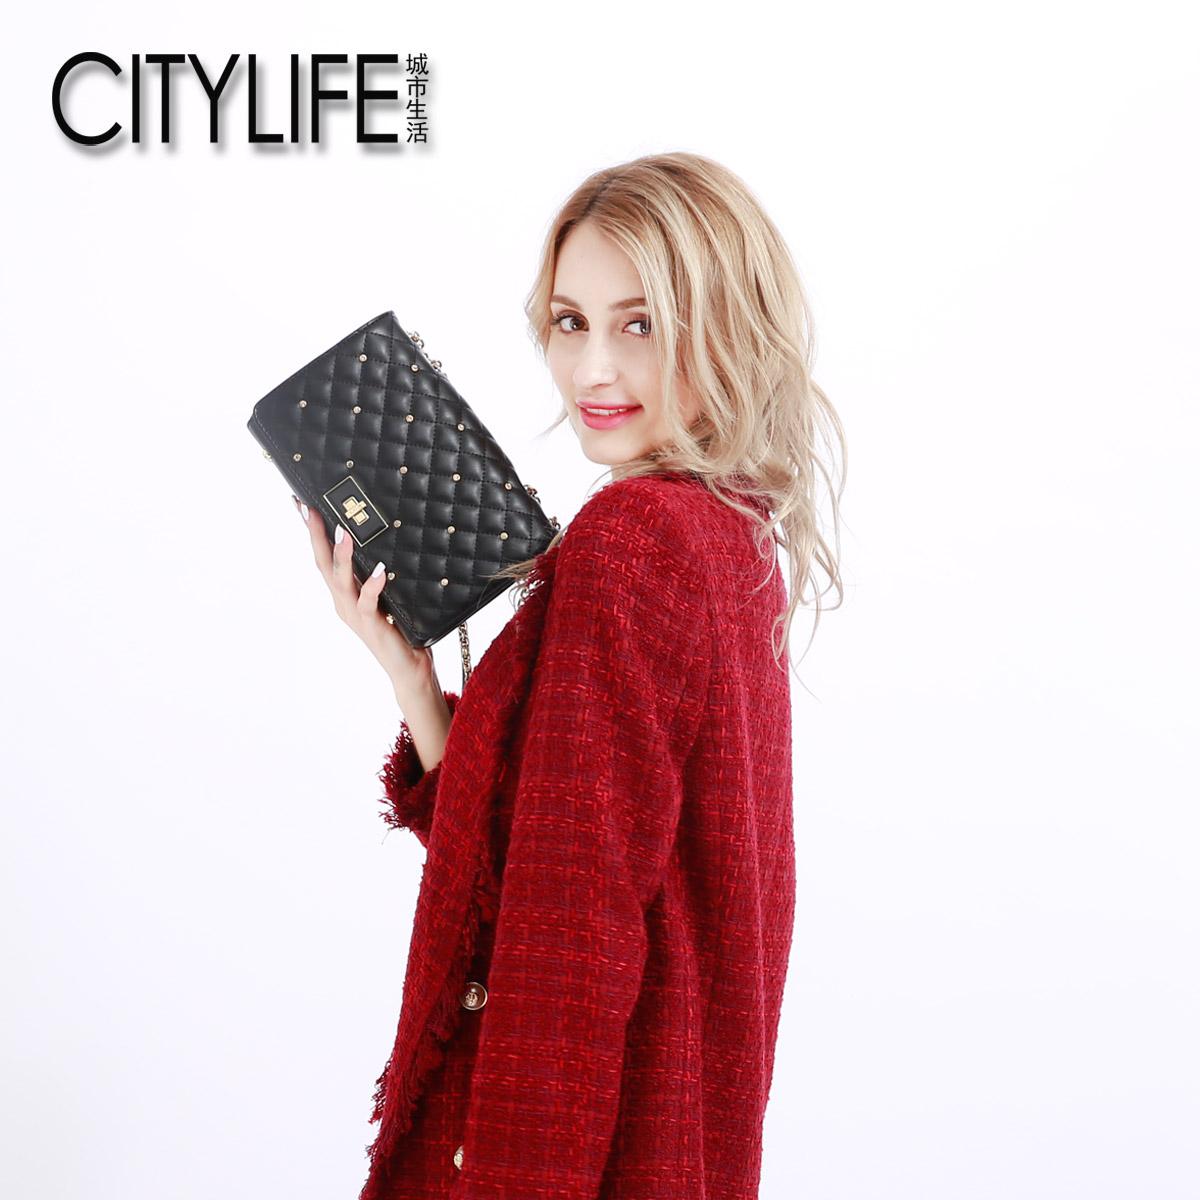 citylife城市生活包包新款菱格��l包小香�L女包�渭缧笨姘�小包包